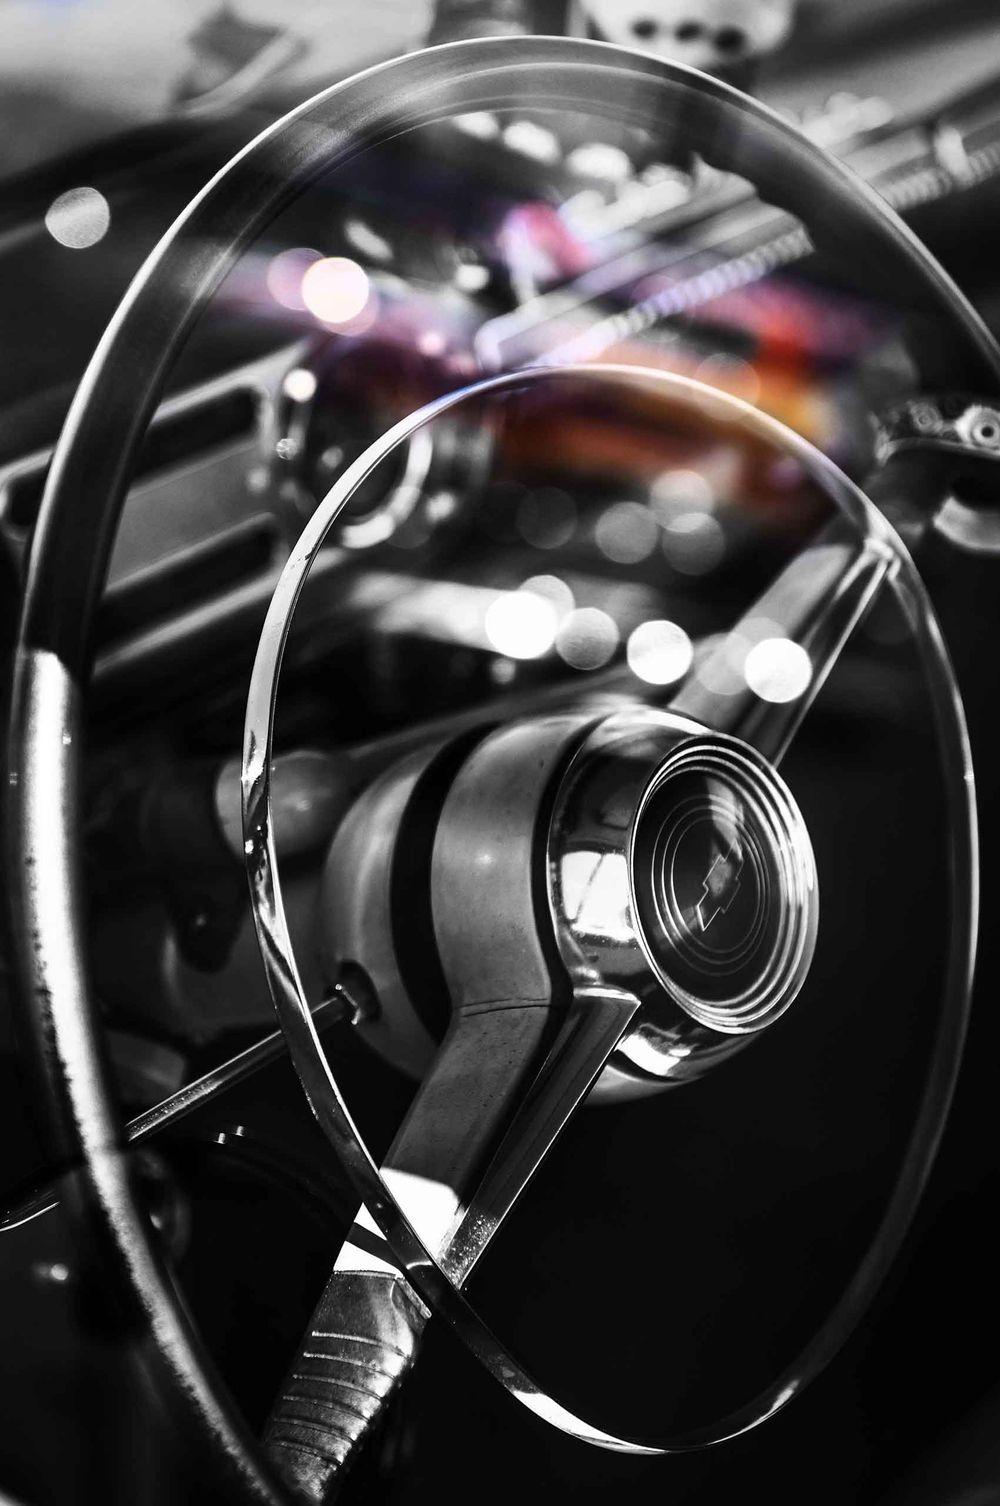 steeringwheel-vivalasvegas-rockabillyweekend-lasvegas-by-henrikolundphotography.jpg